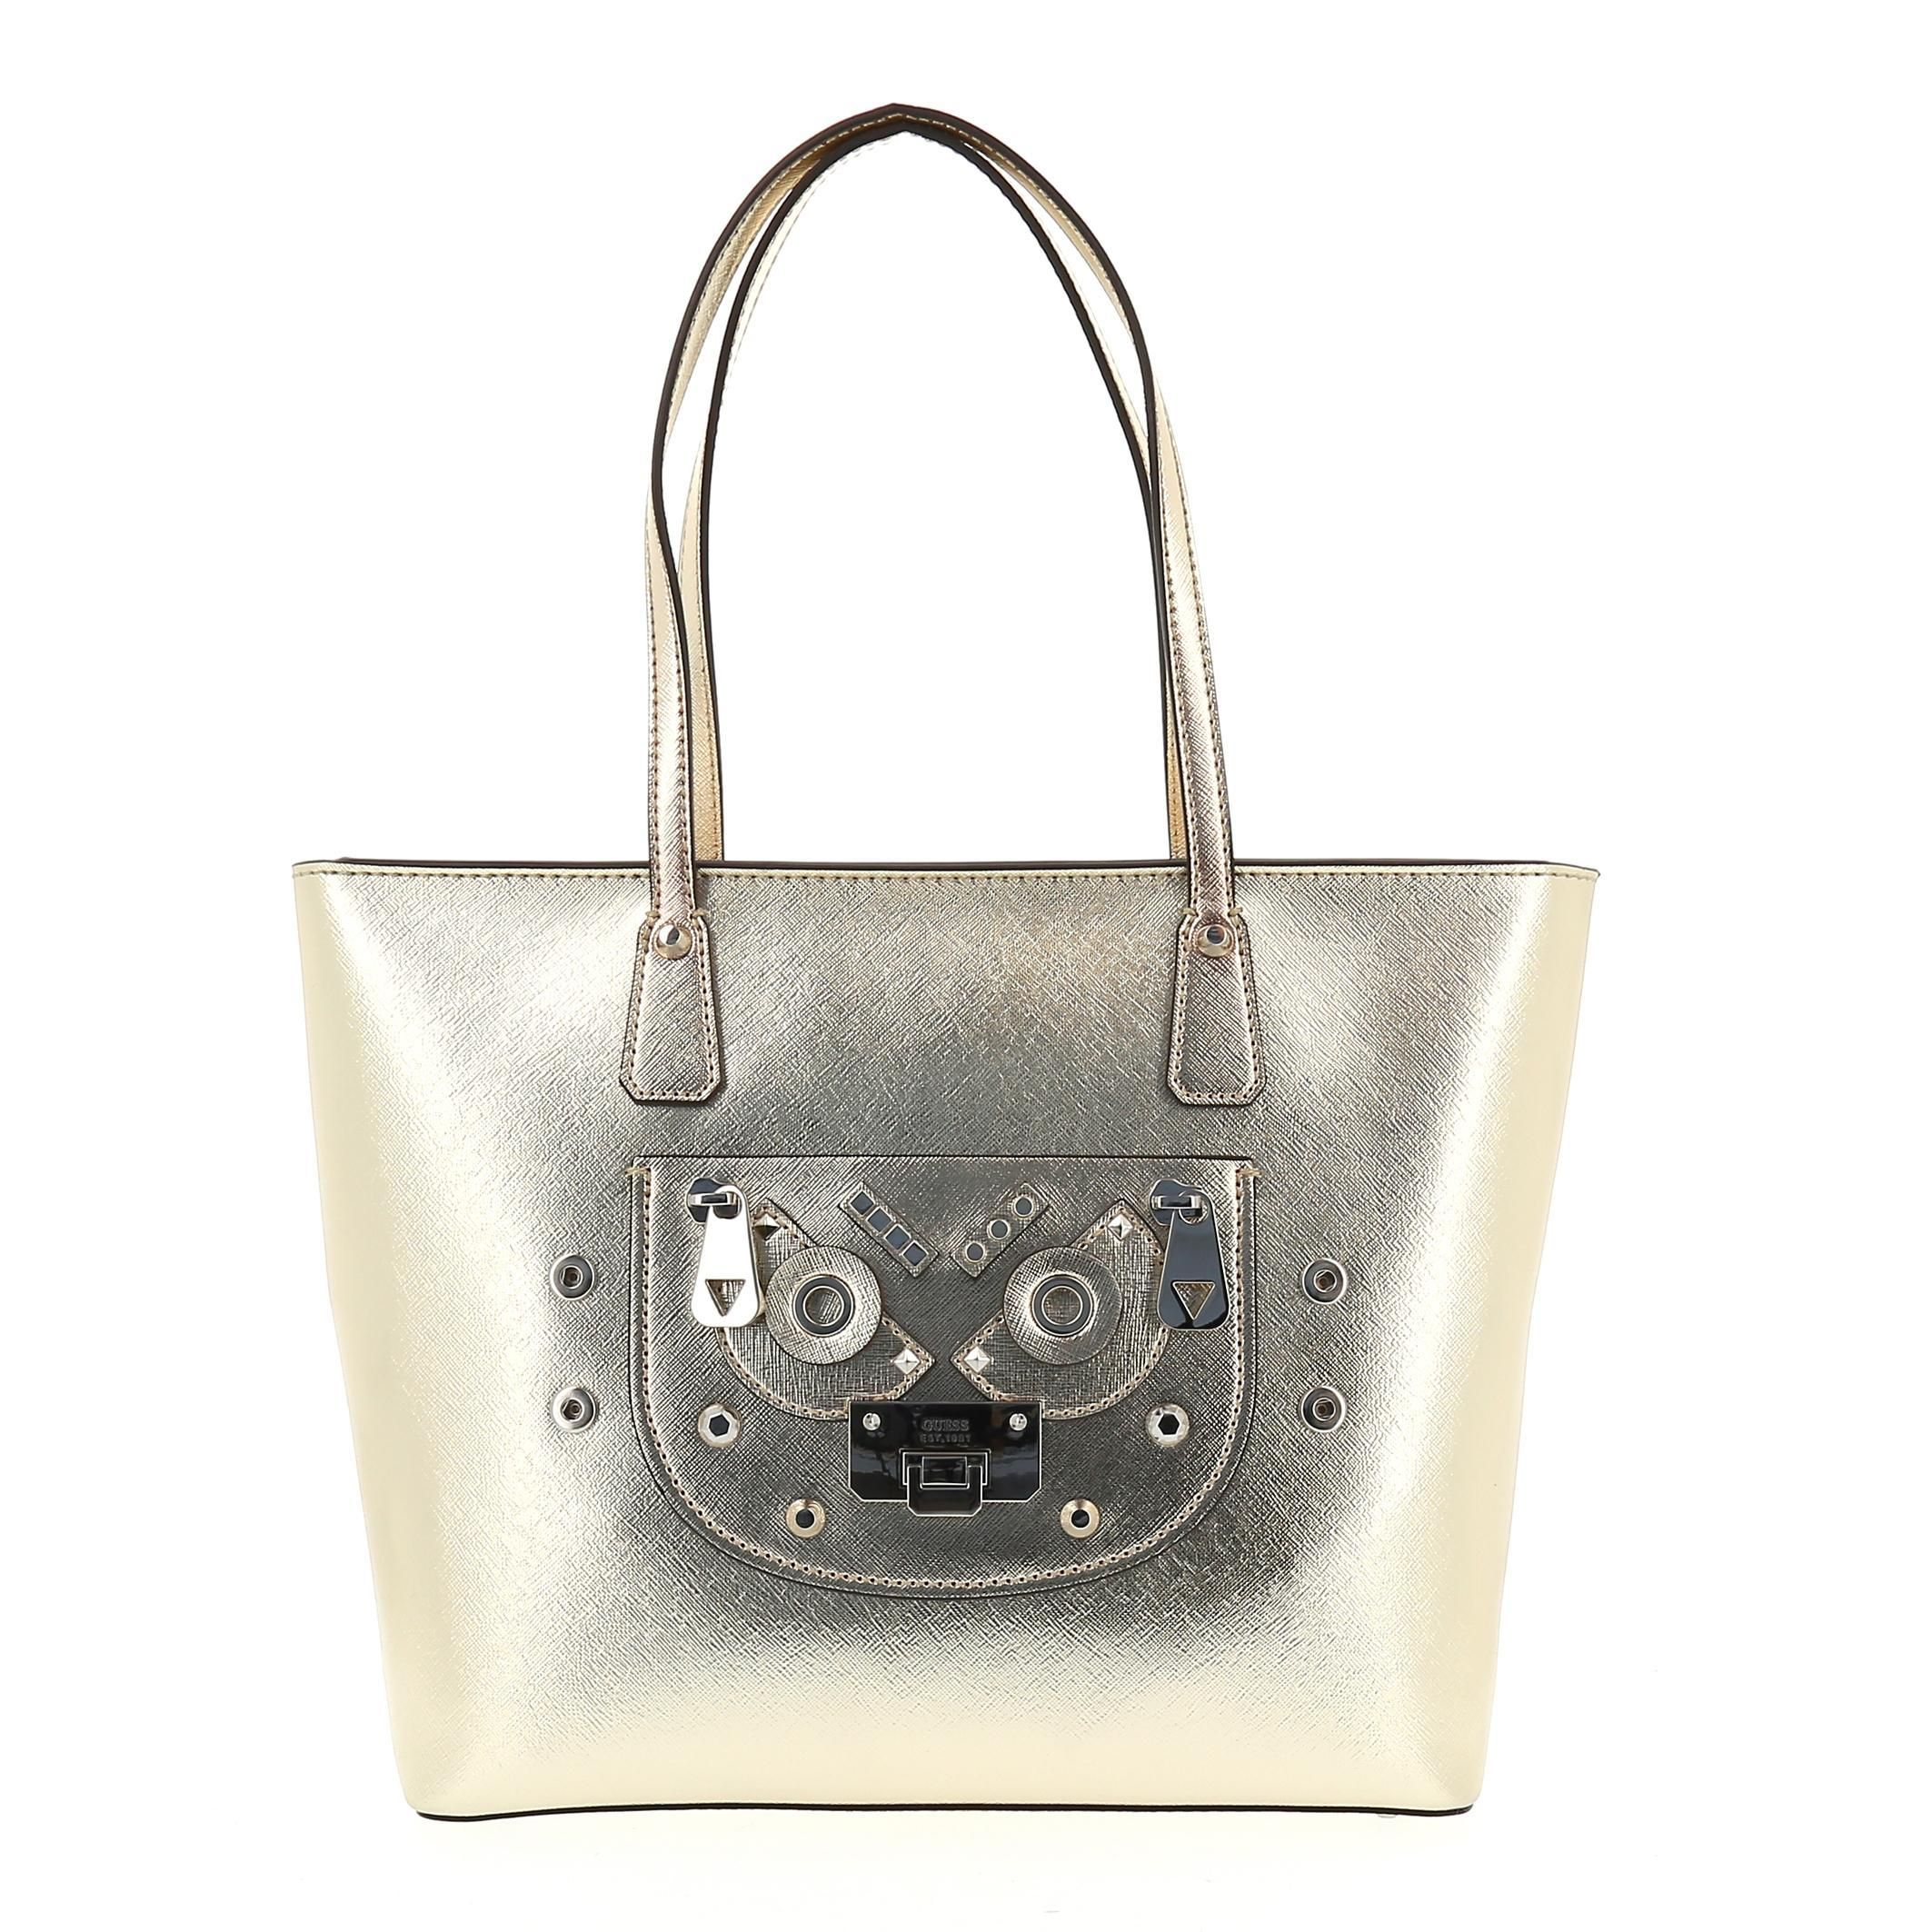 Guess - HWGD6777230 Shopping Bags 508000213820e